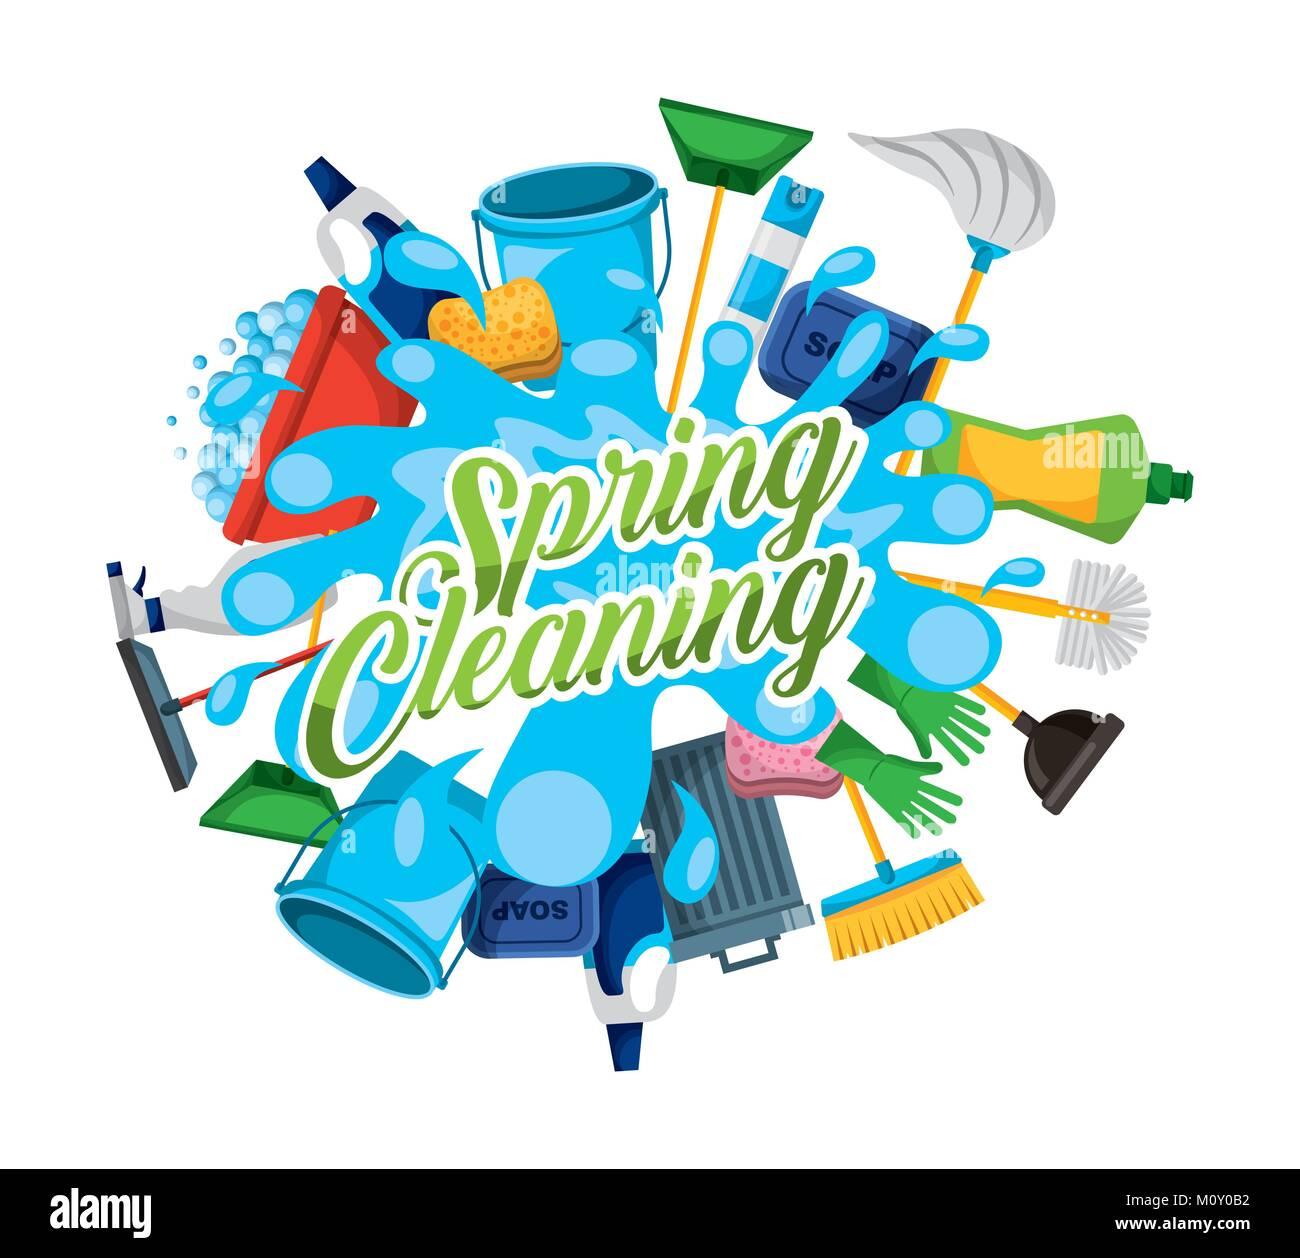 spring cleaning water splash work supplies stock vector art